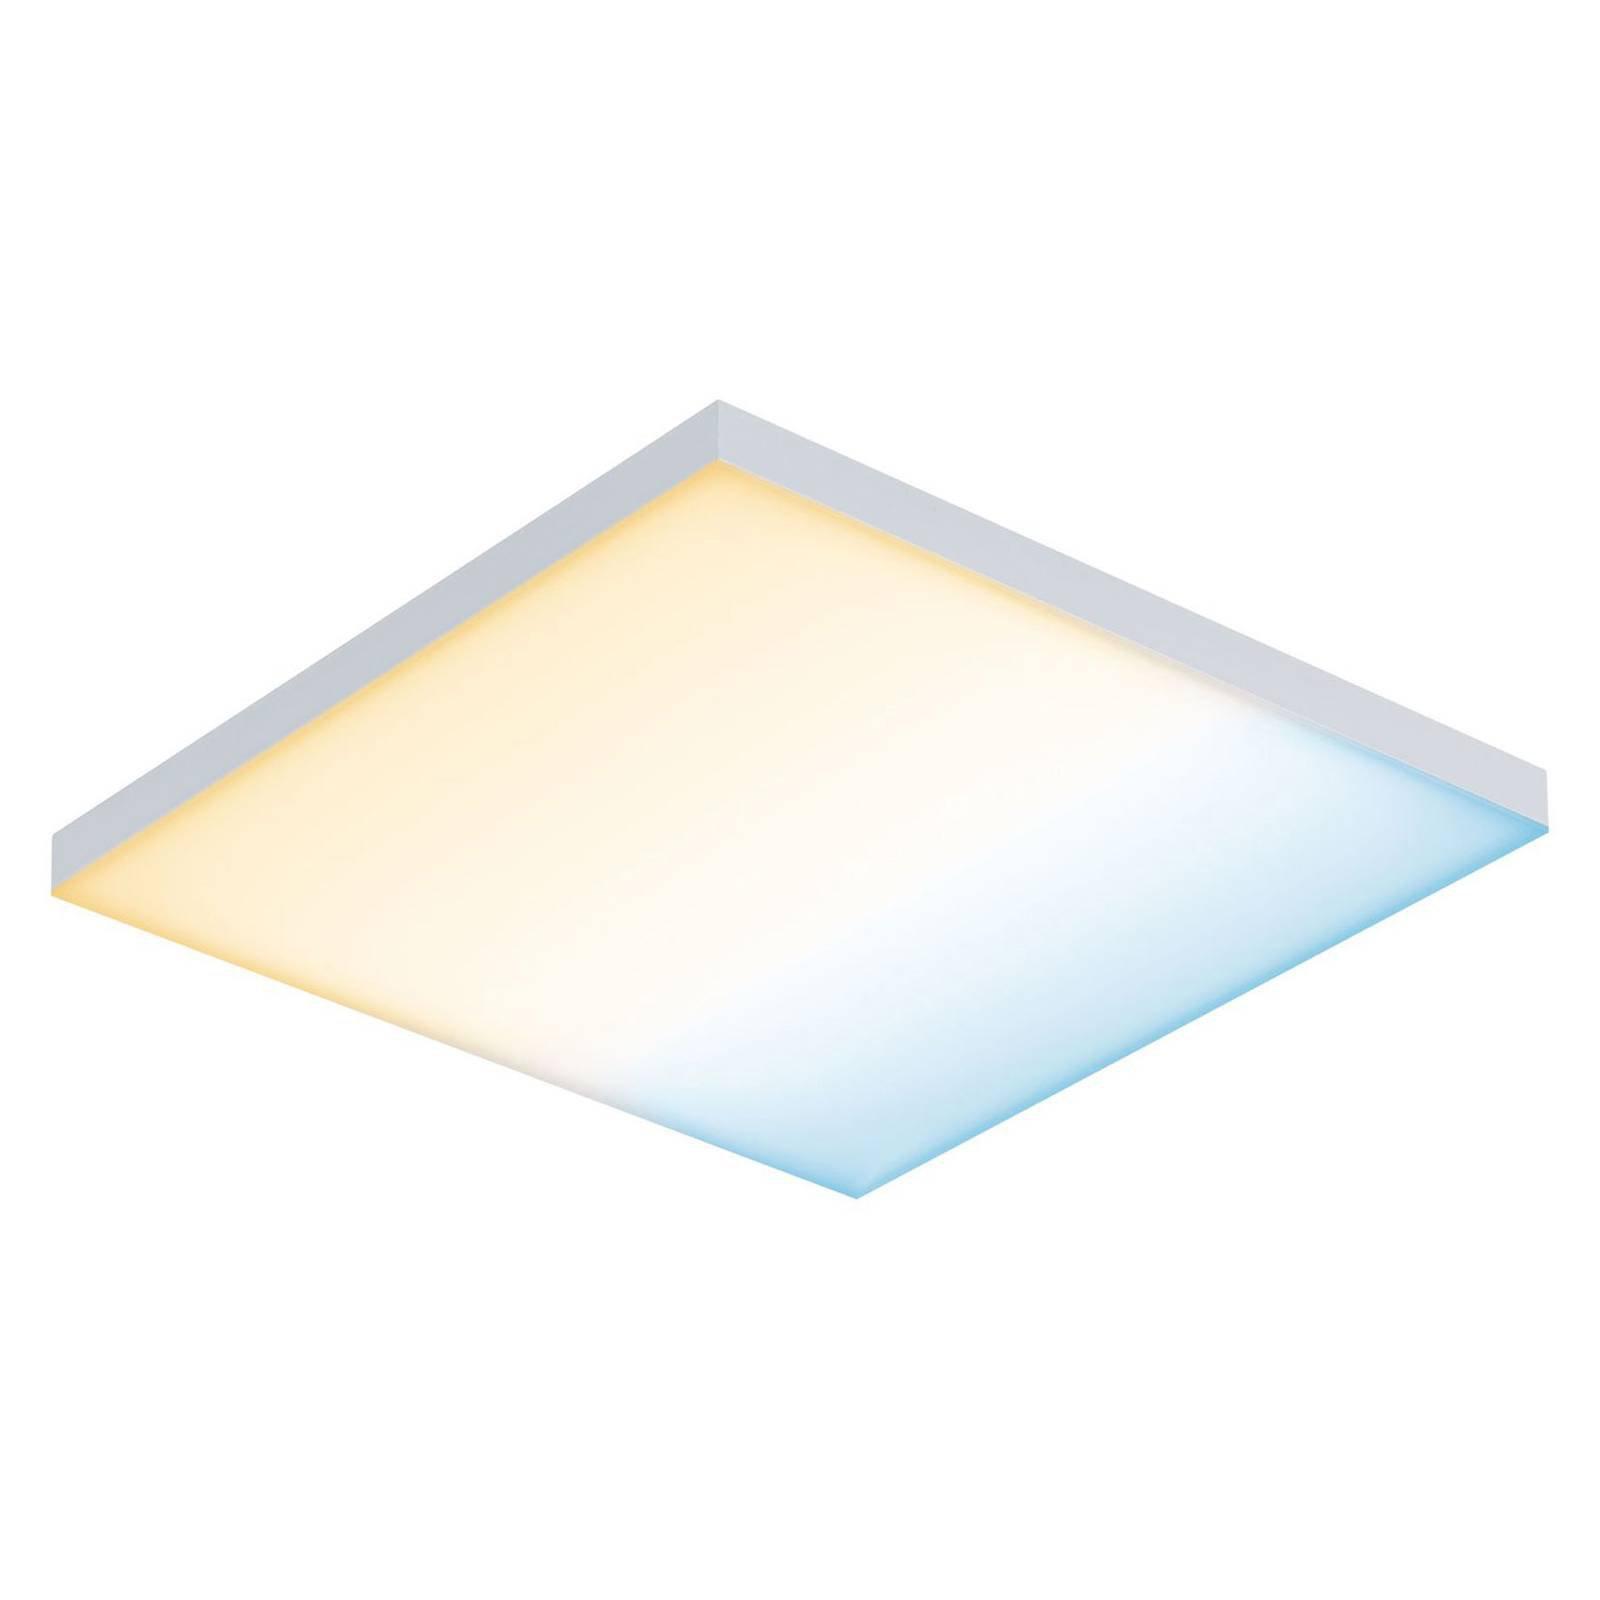 Paulmann Velora LED-panel Zigbee 29,5x29,5cm 10,5W